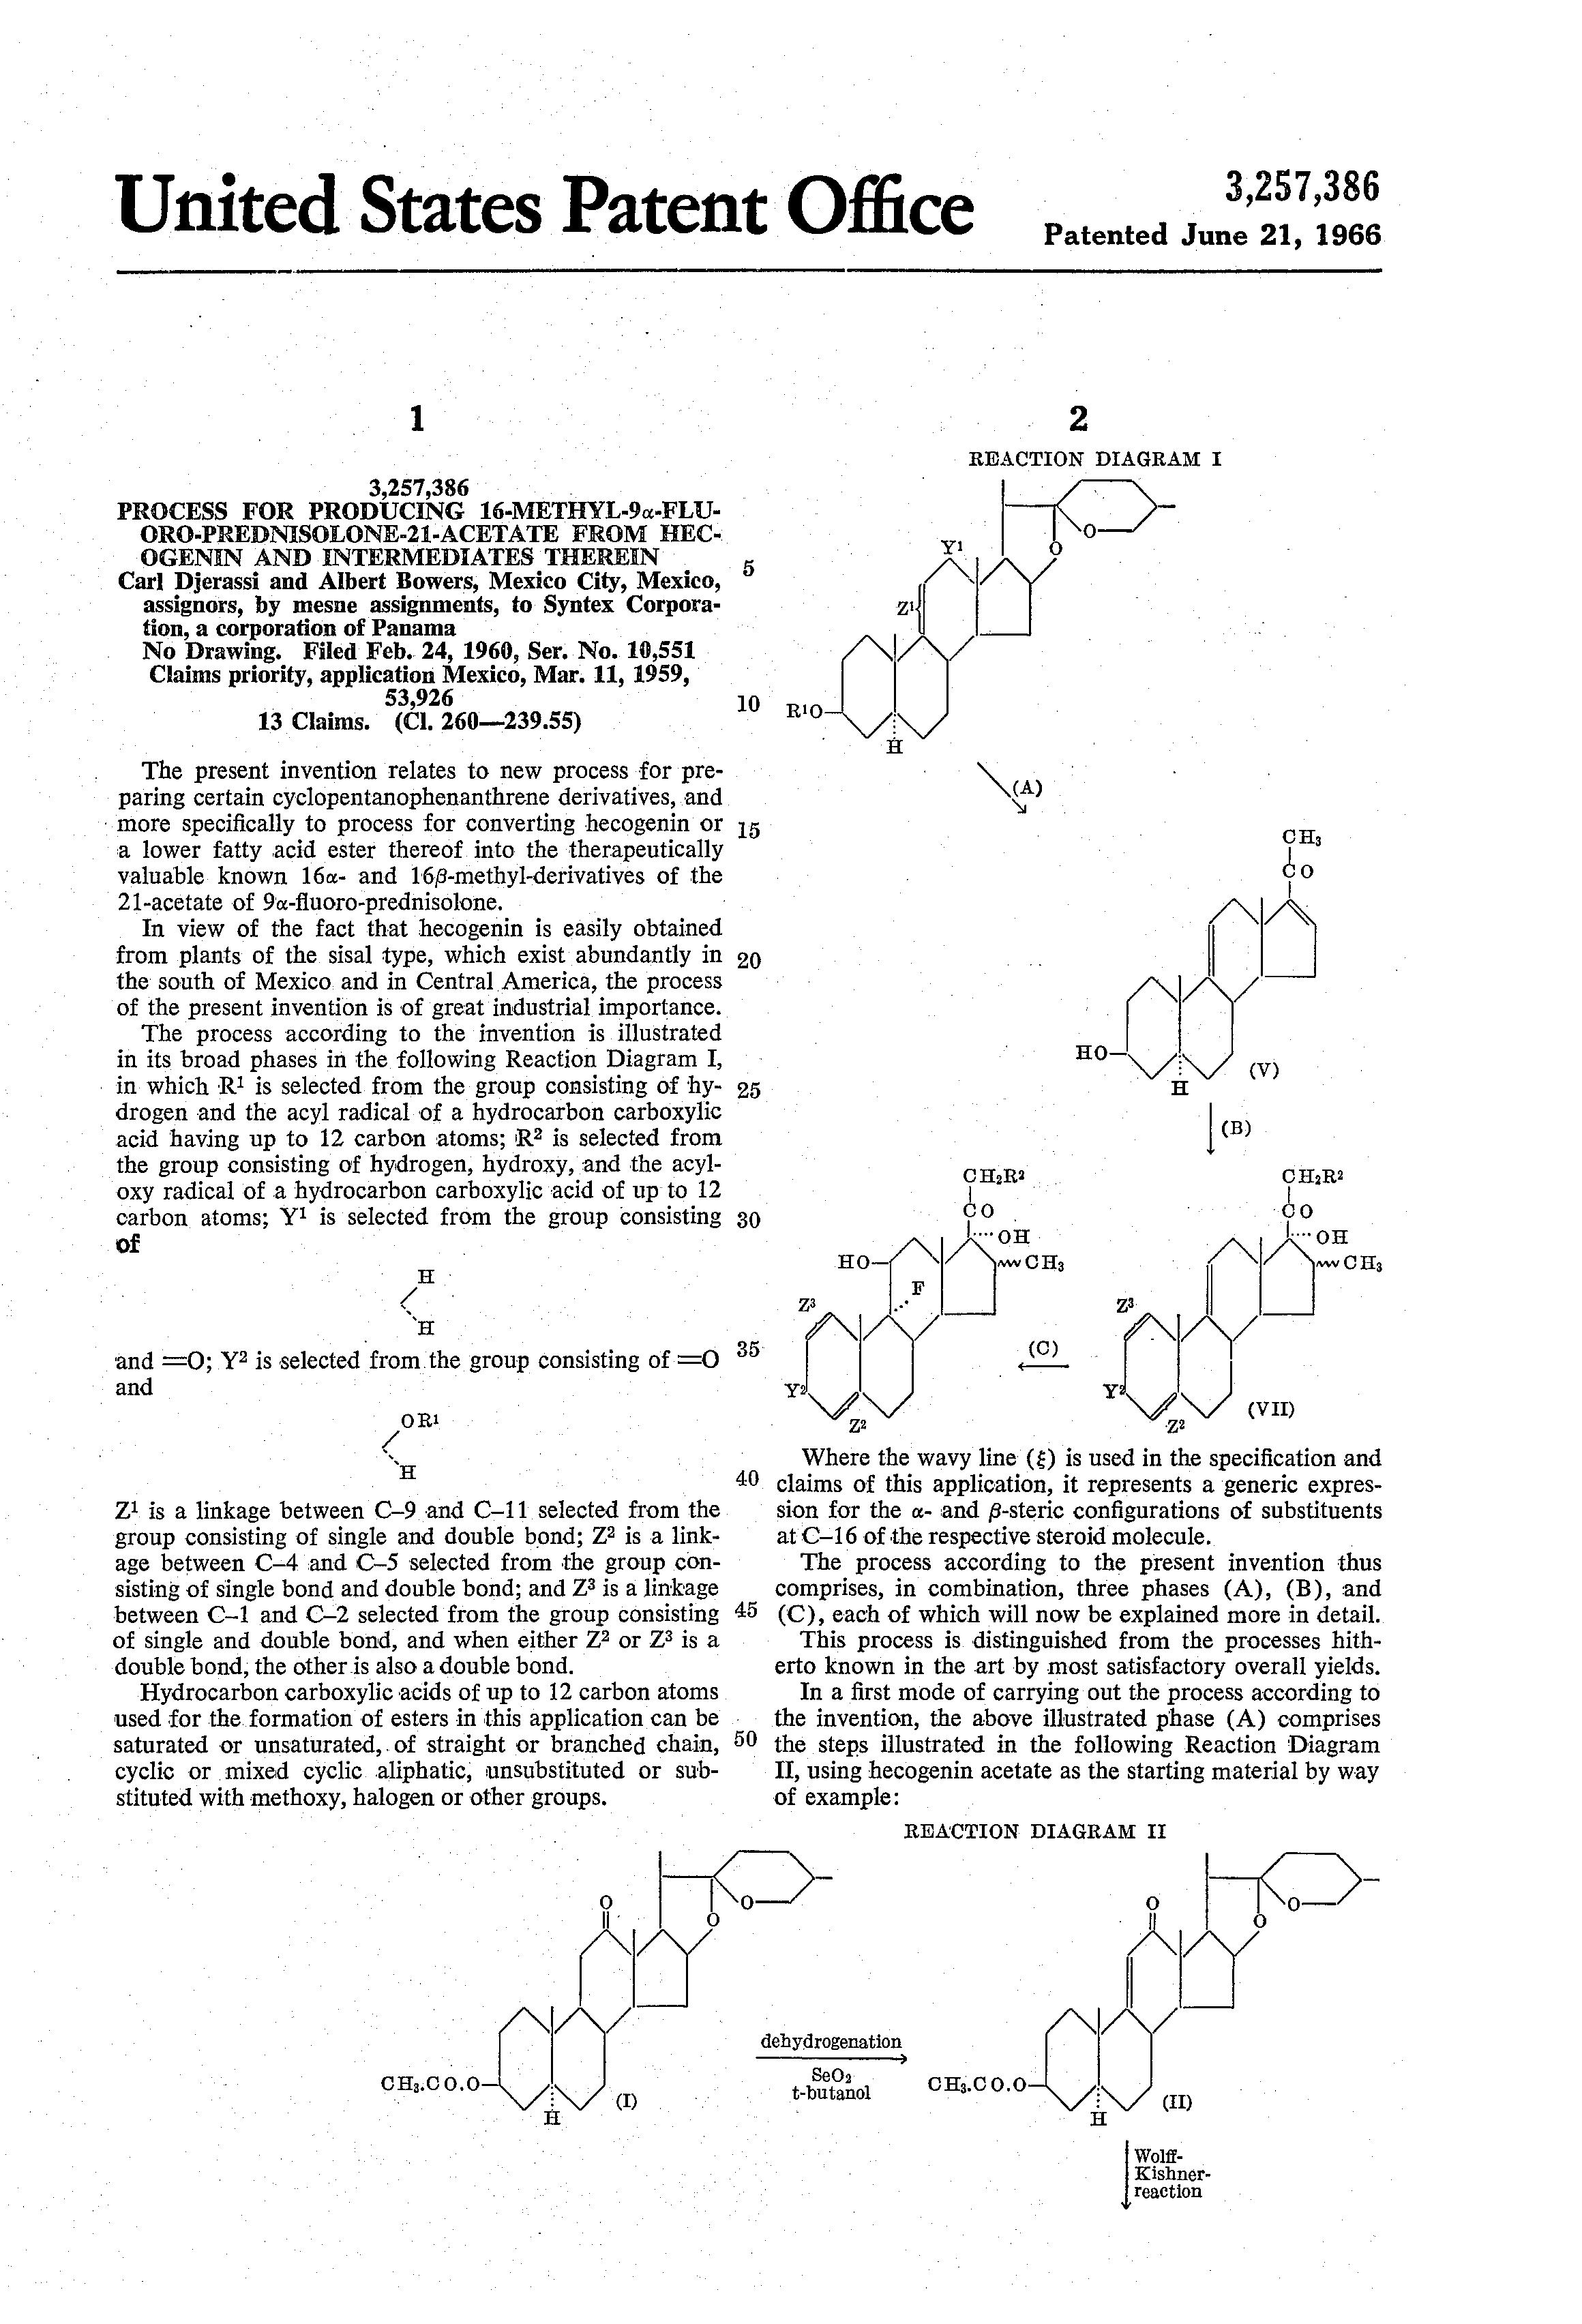 Prednisone 25 mg.doc - Patent Drawing